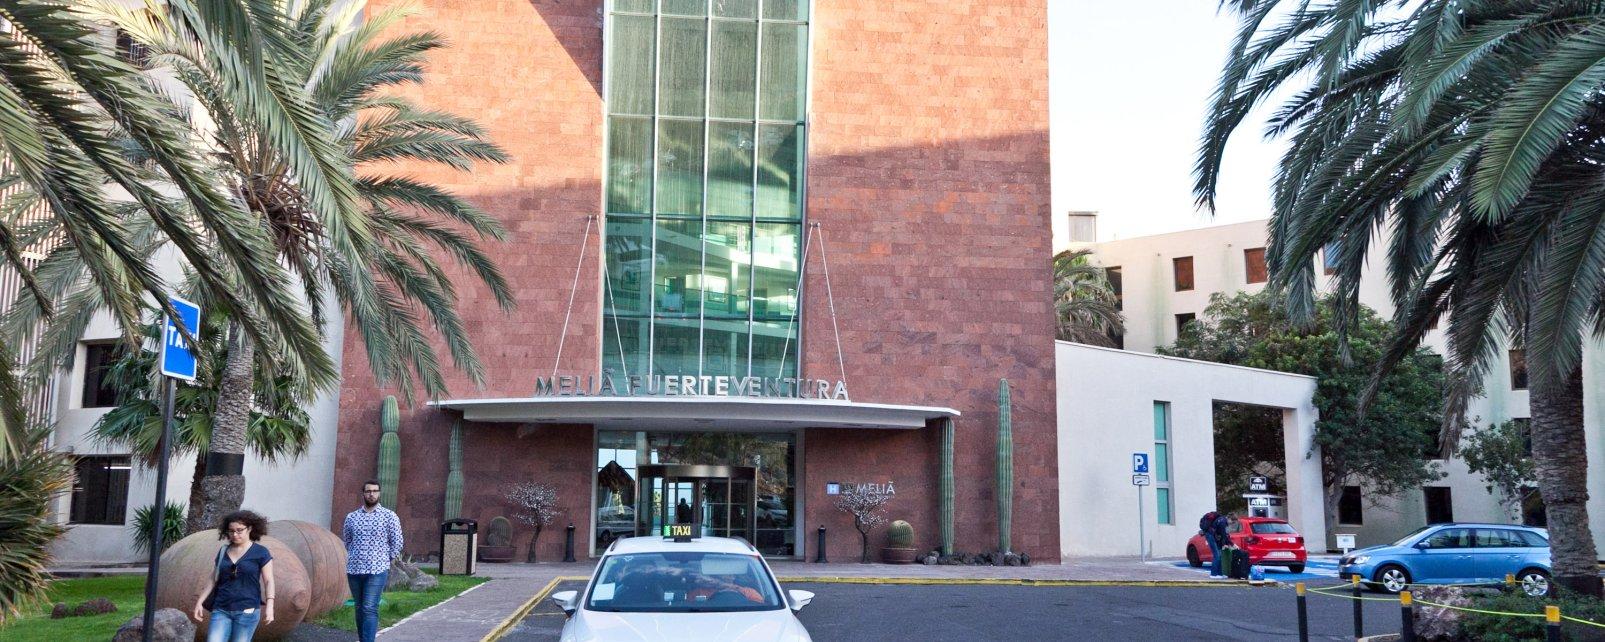 Hôtel Melia Fuerteventura